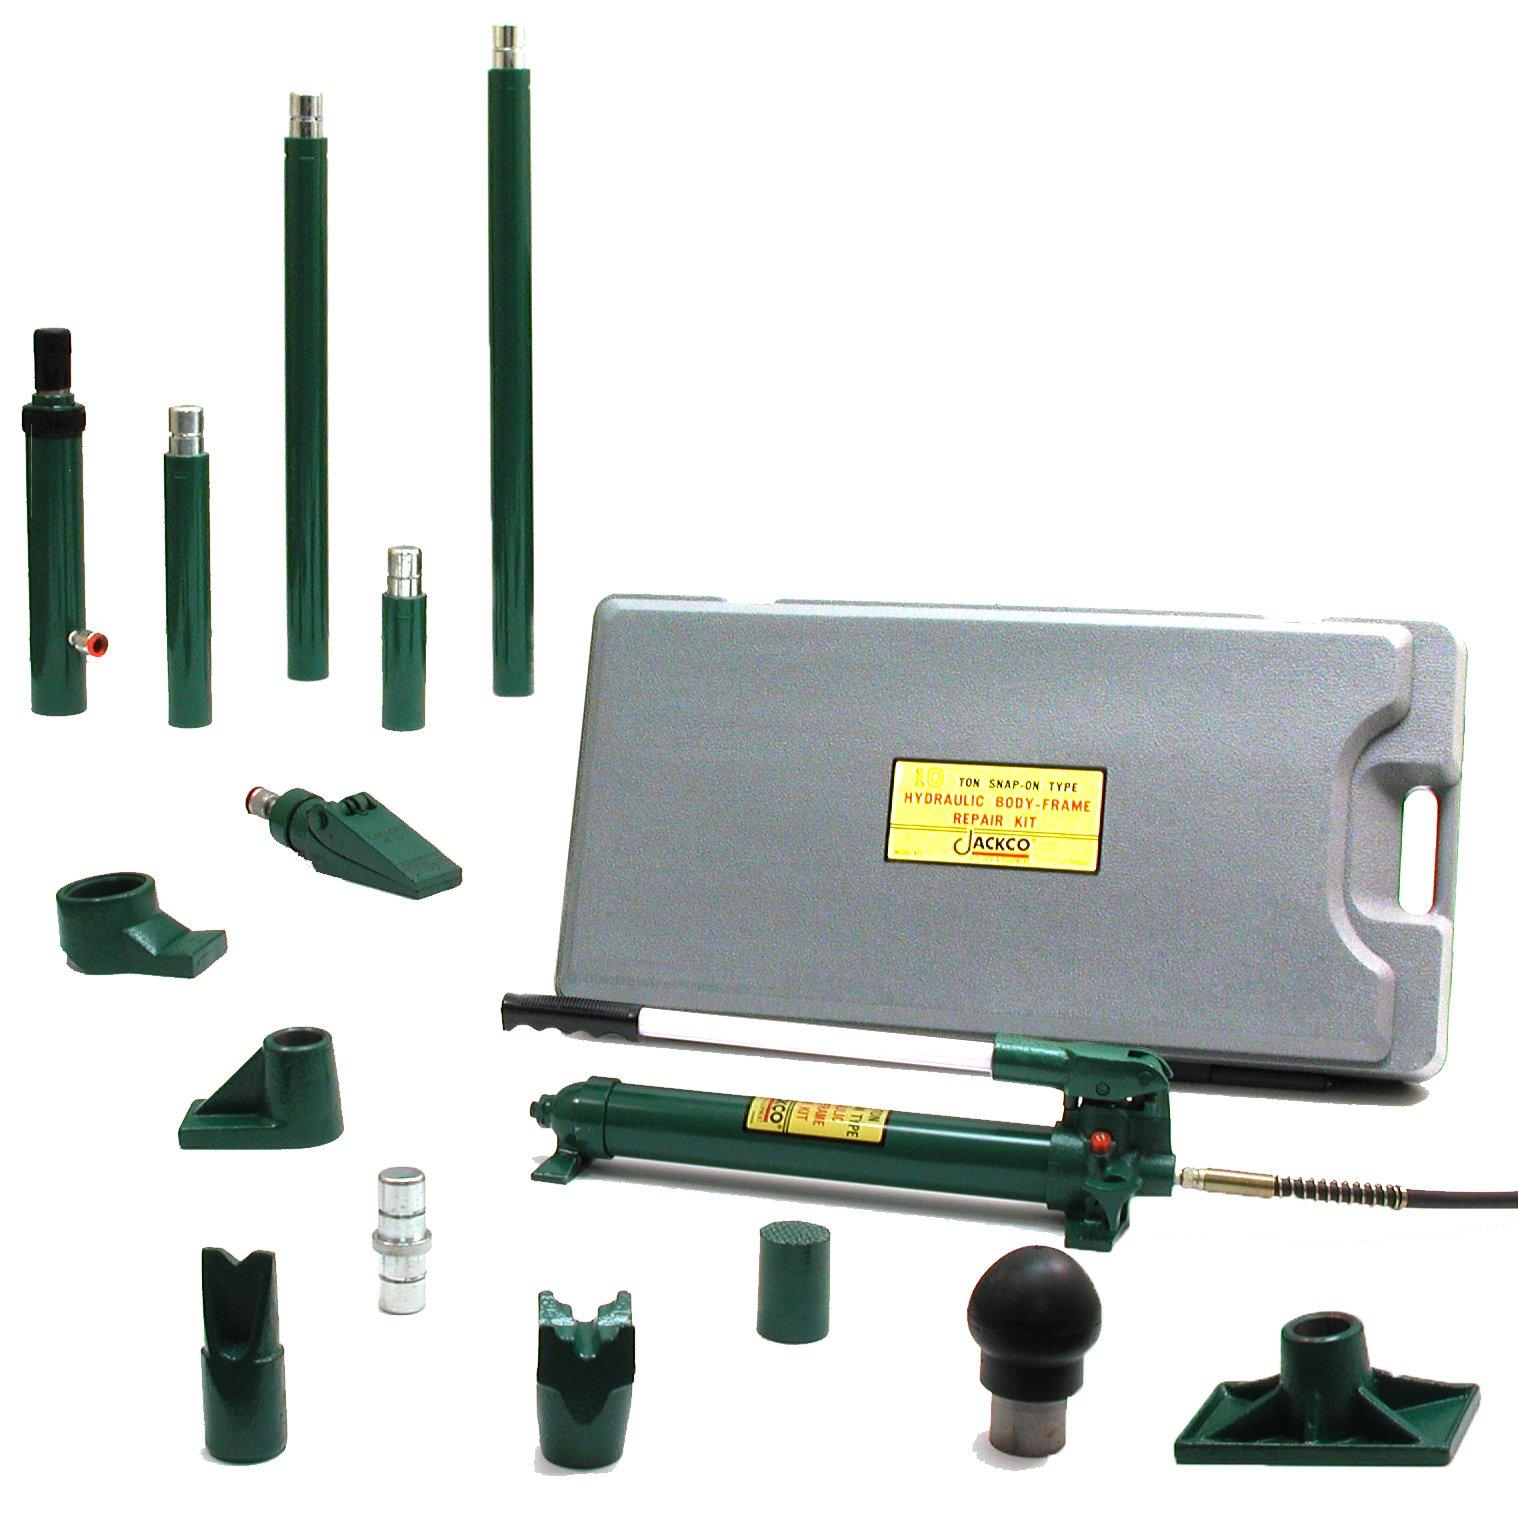 Jackco 10 Ton Snap-on Type Hydraulic Body Frame Repair Kit